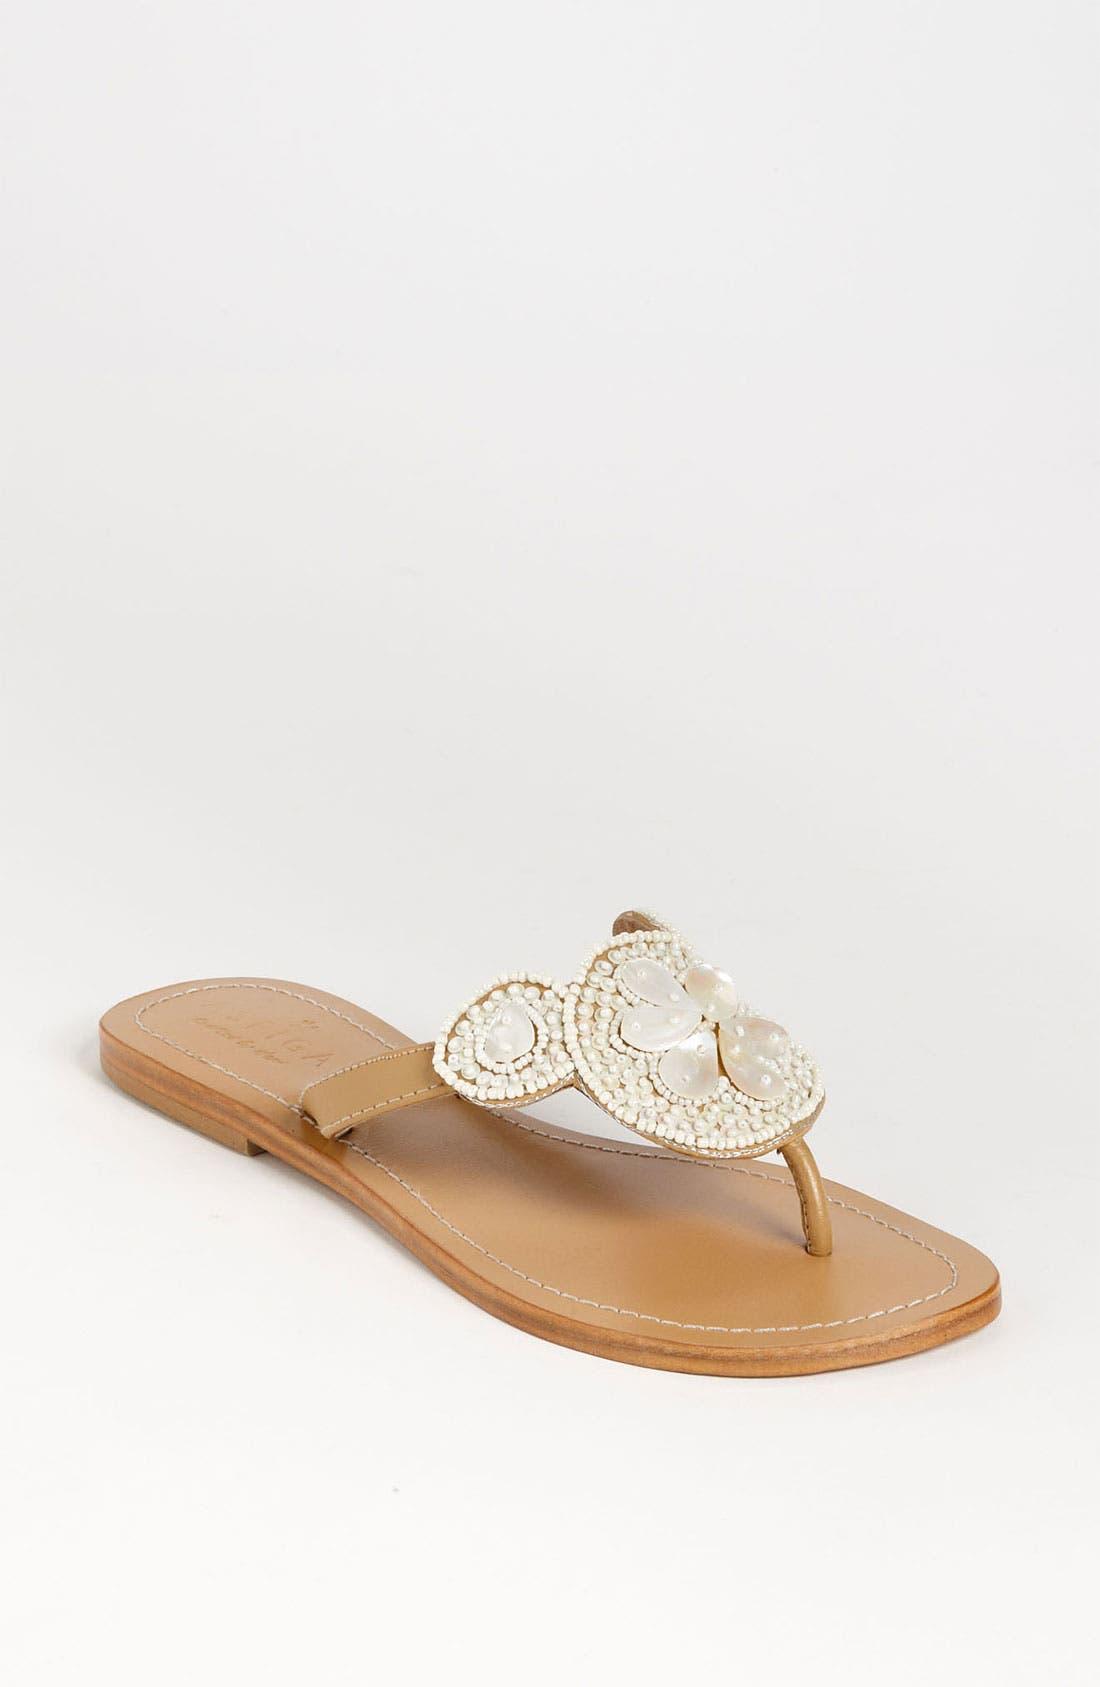 Main Image - Aspiga 'Anala' Sandal